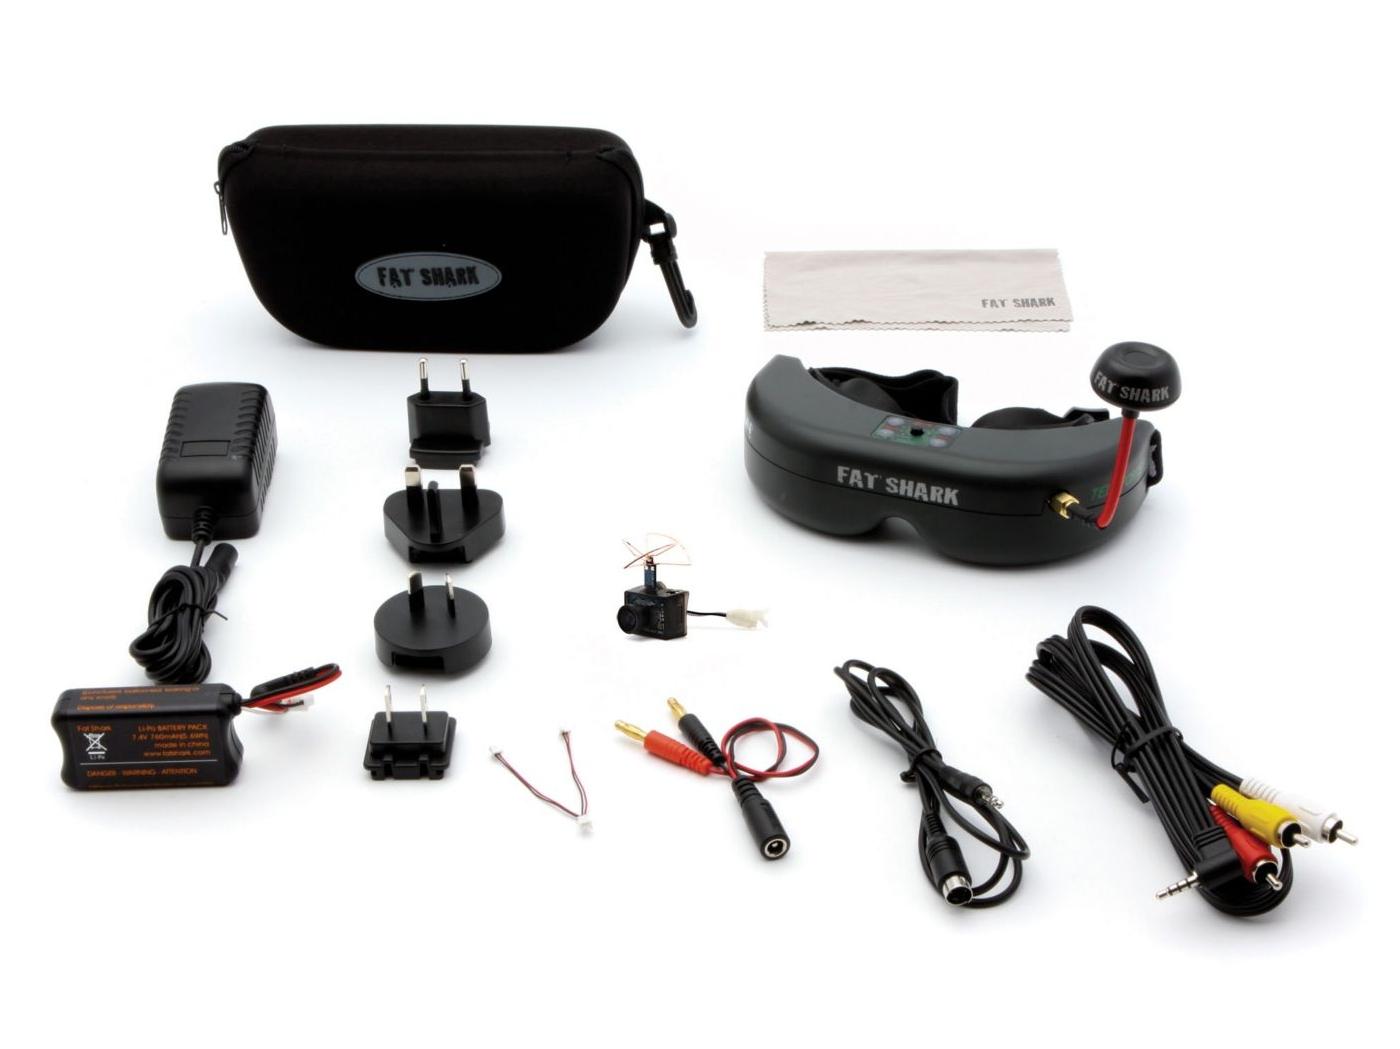 FPV комплект: камера Ultra Micro FPV, очки FPV, аксессуары